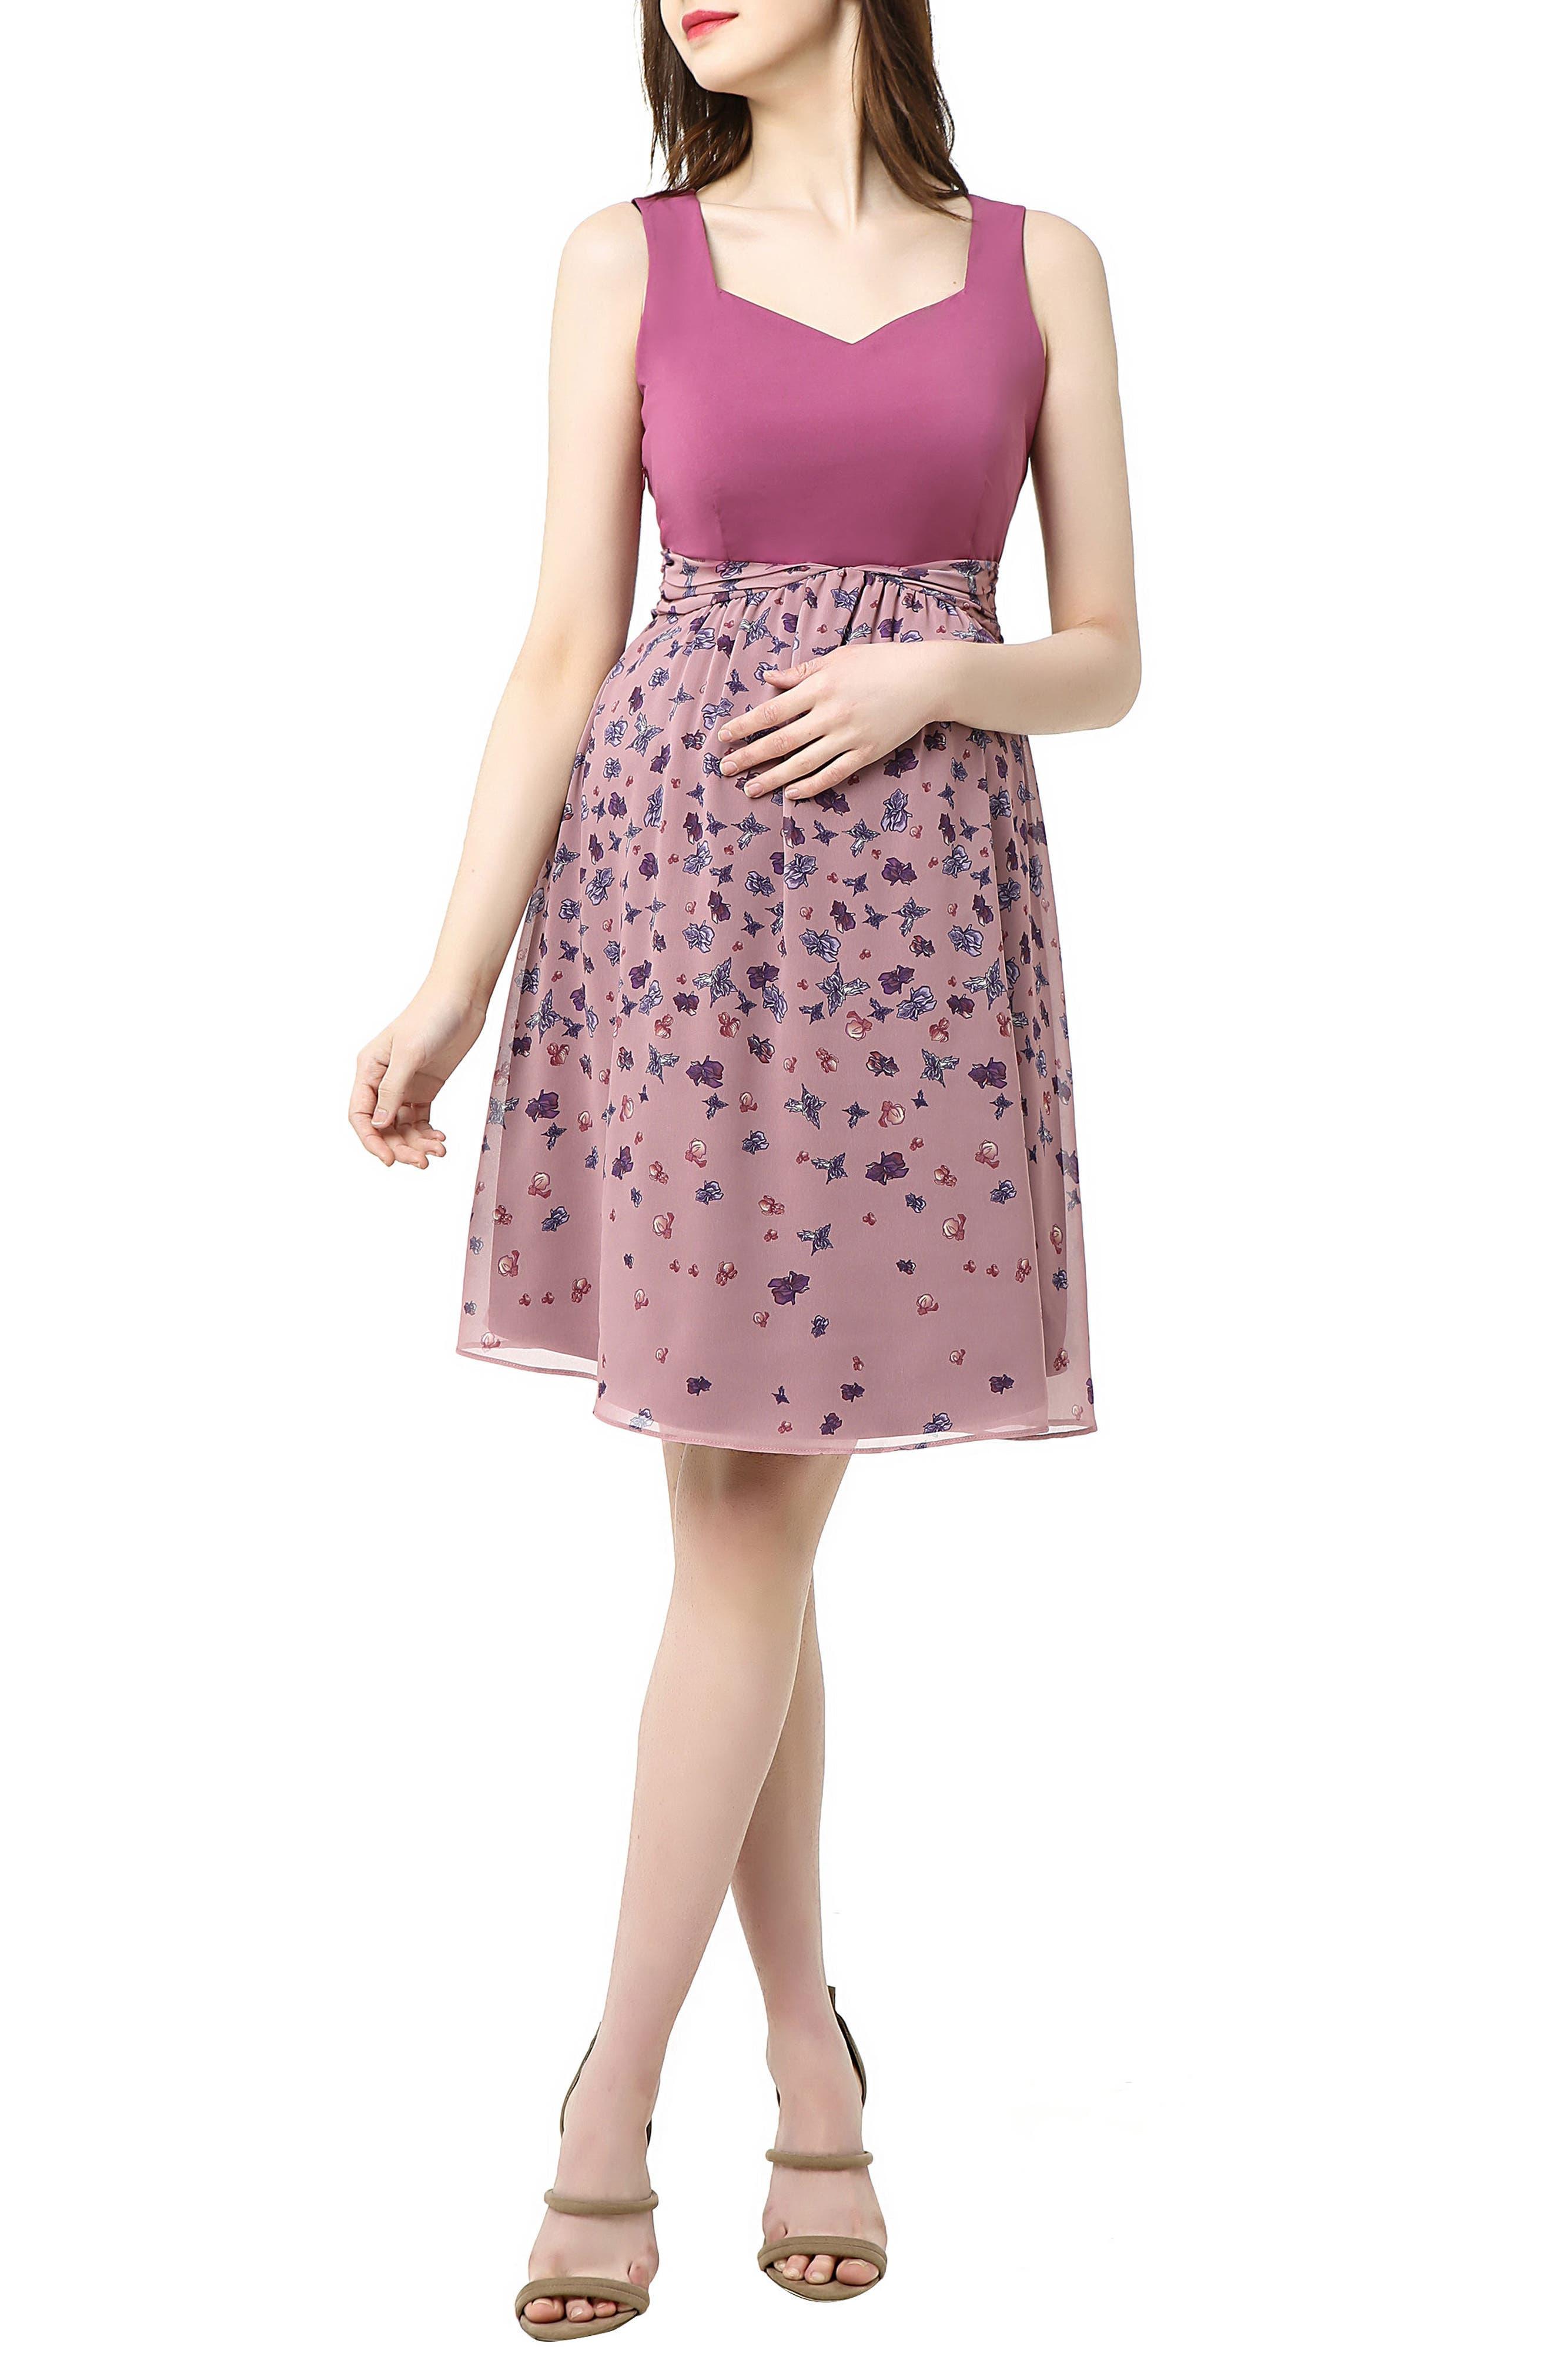 Kimi And Kai Libby Print Skirt Maternity Dress, Pink